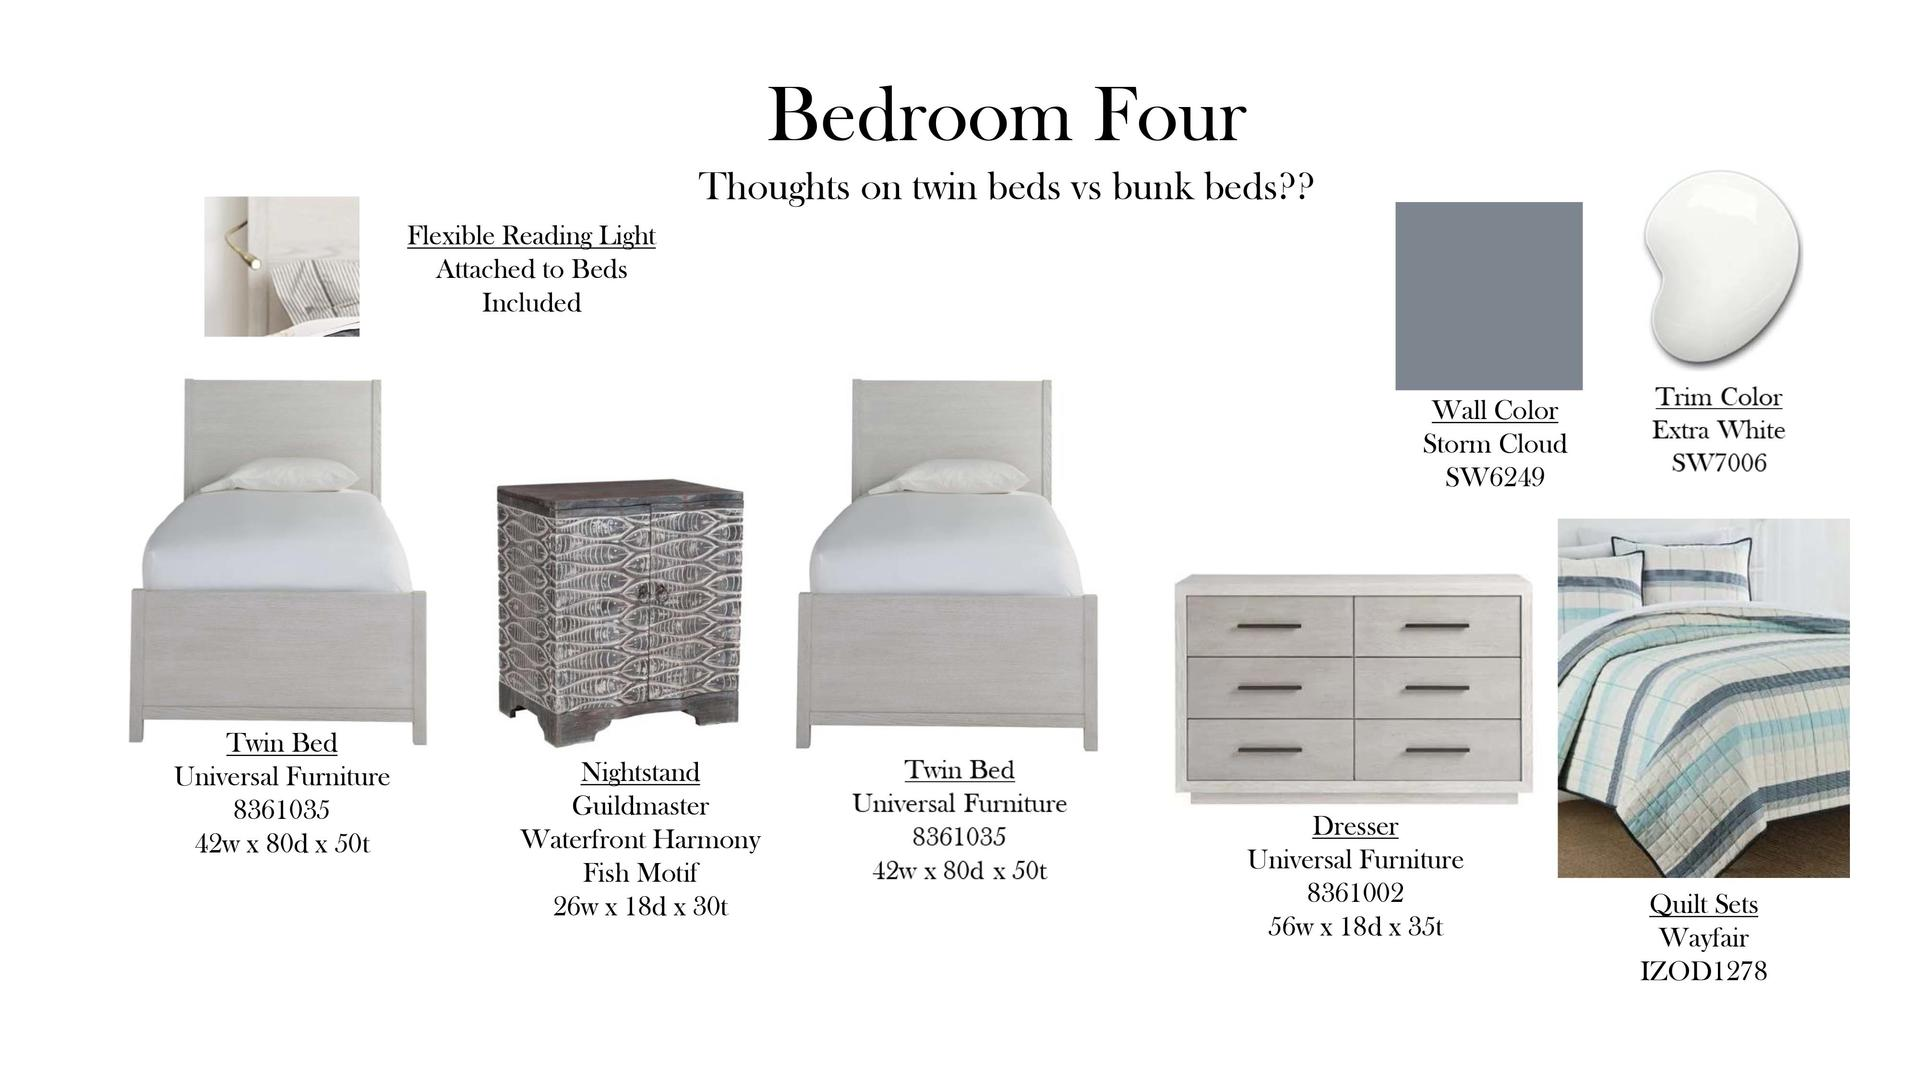 Bedroom Four Specs